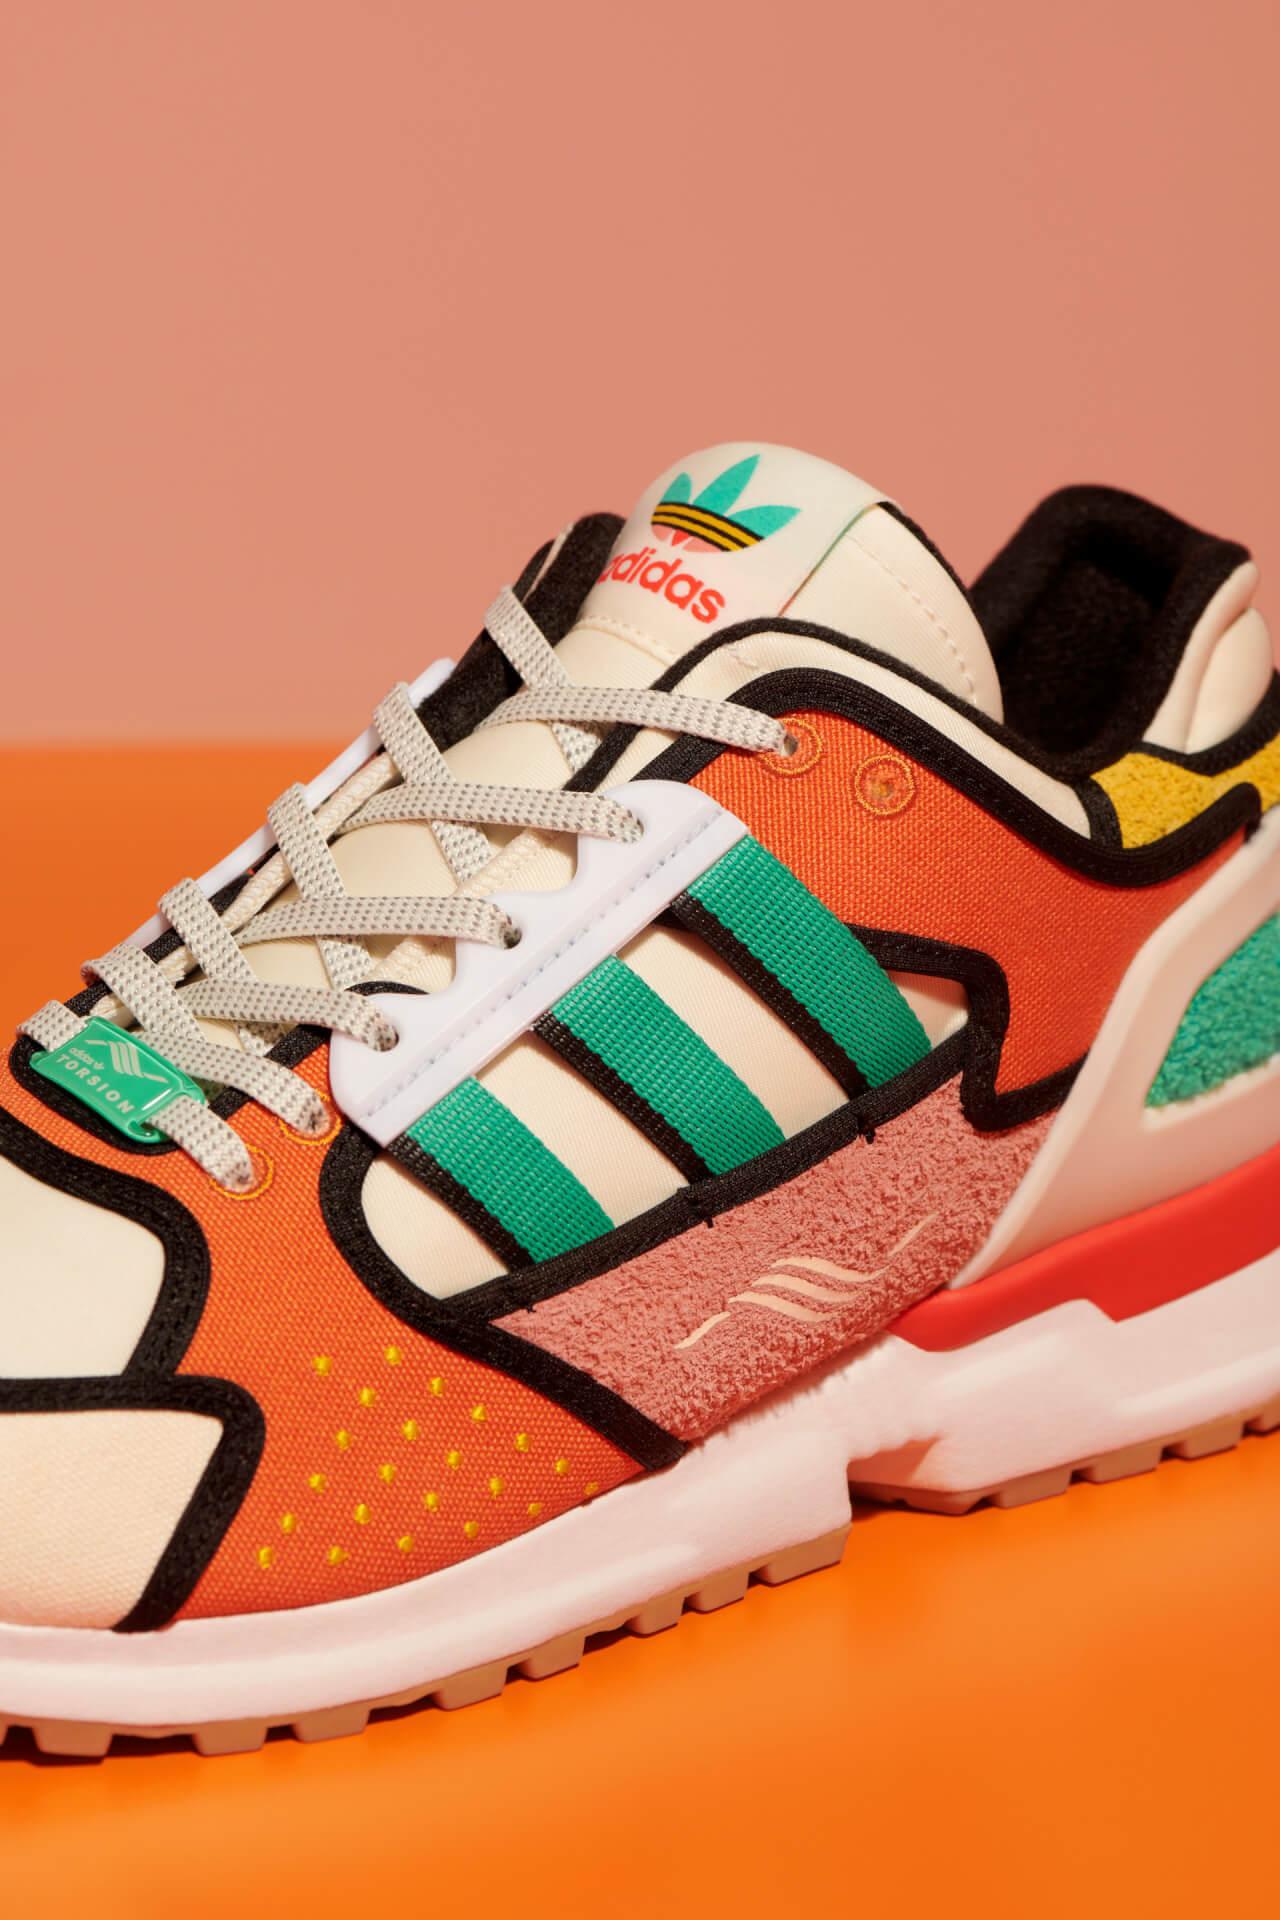 adidas Originals「A-ZX」シリーズにザ・シンプソンズKRUSTY BURGERをモチーフにしたモデルが登場!本日より販売開始 life210212_adidas_thesimpsons_3